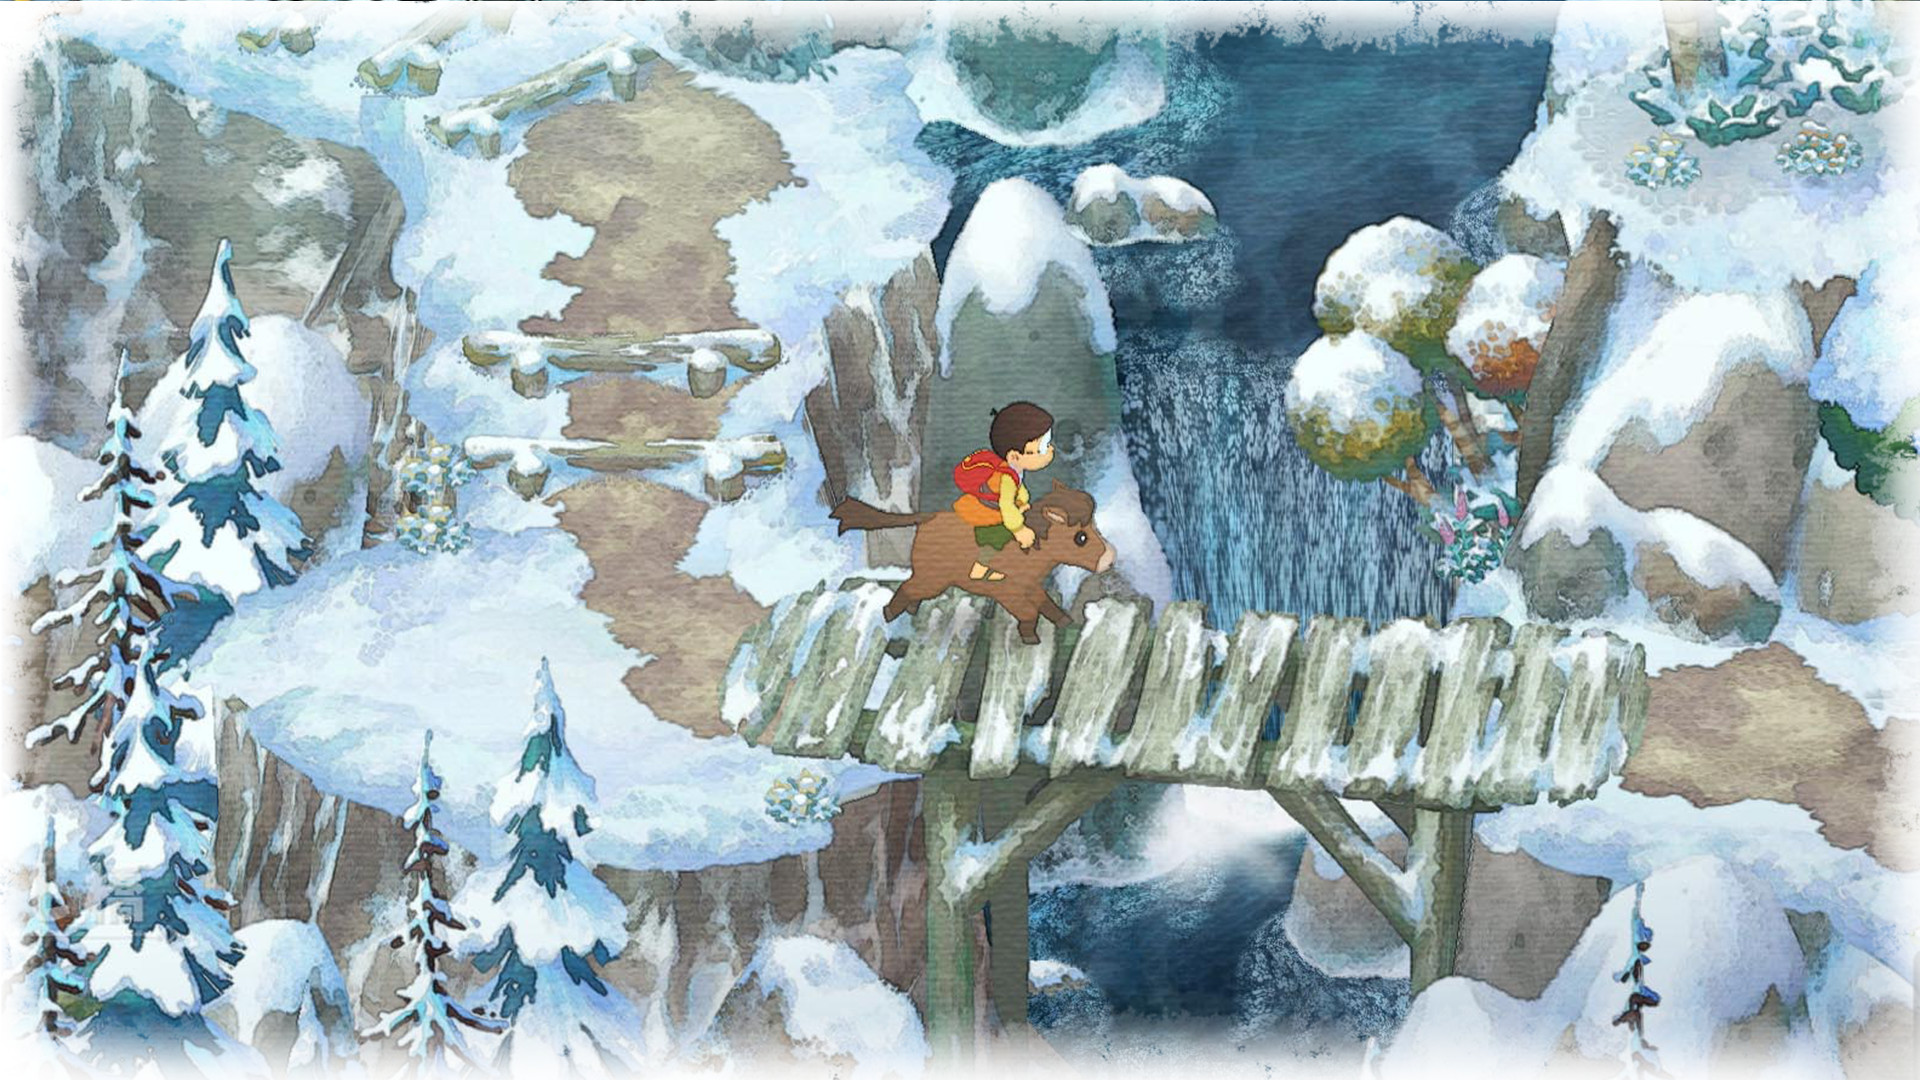 Doraemon Story of Seasons Screenshot 3